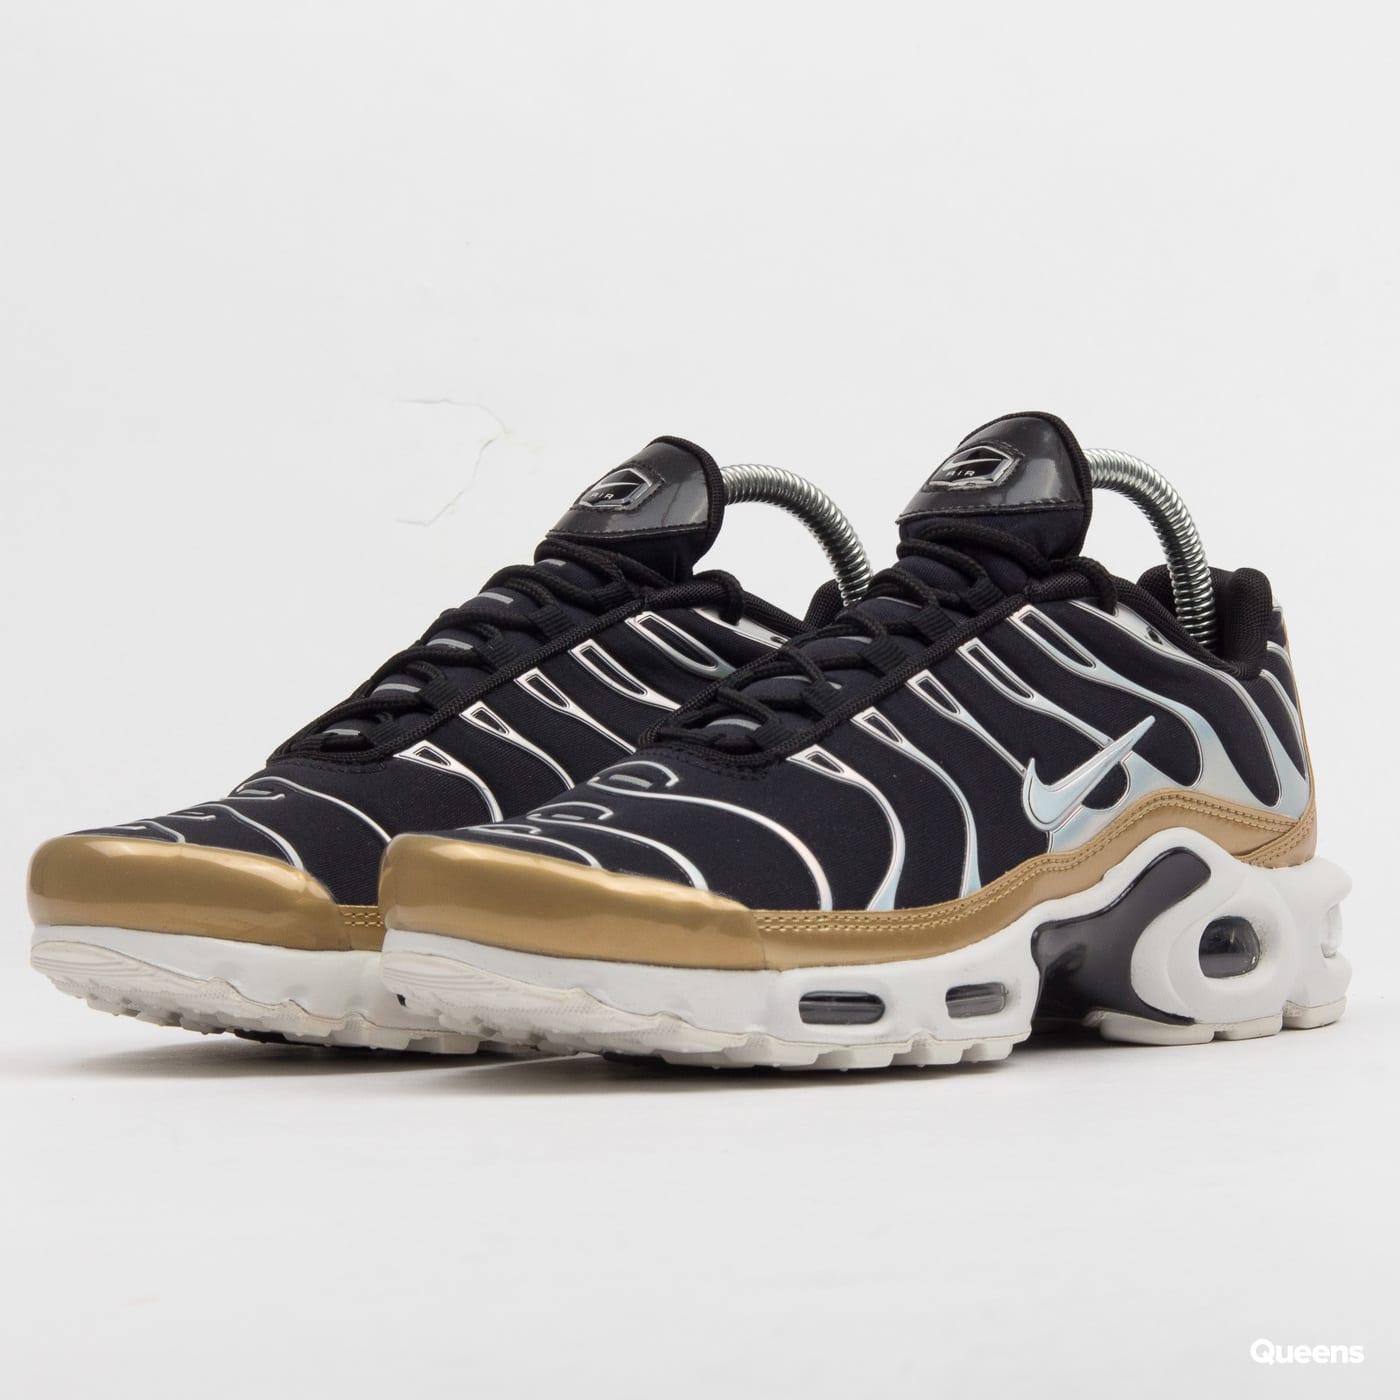 billig Nike Air Max Plus 605112 055 Shoes Black Nike Air Max